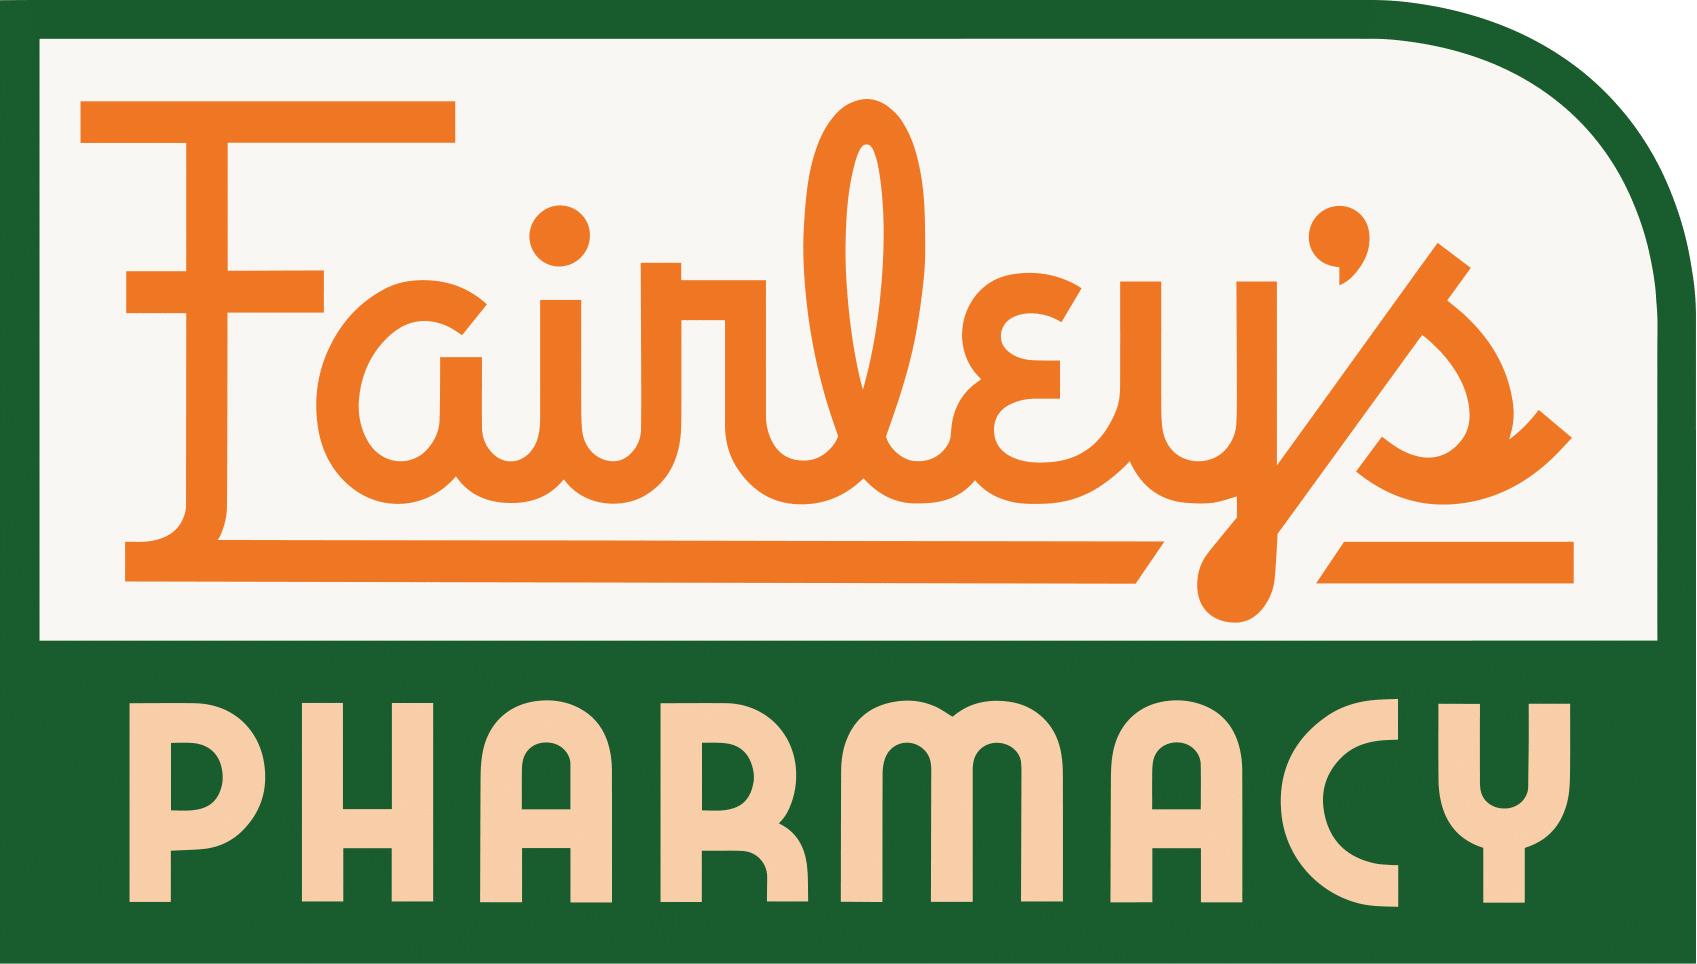 Fairley's Pharmacy